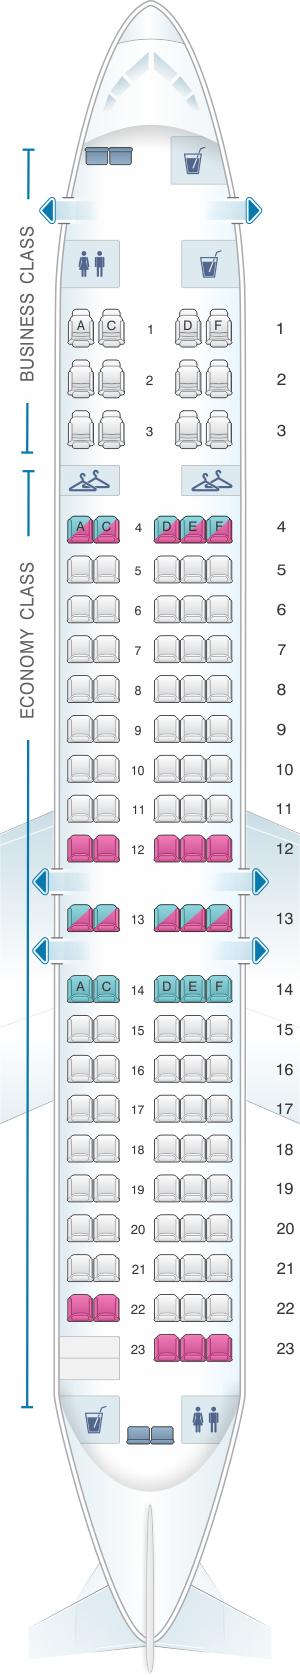 Seat map for Qantas Airways Boeing B717 200 110PAX